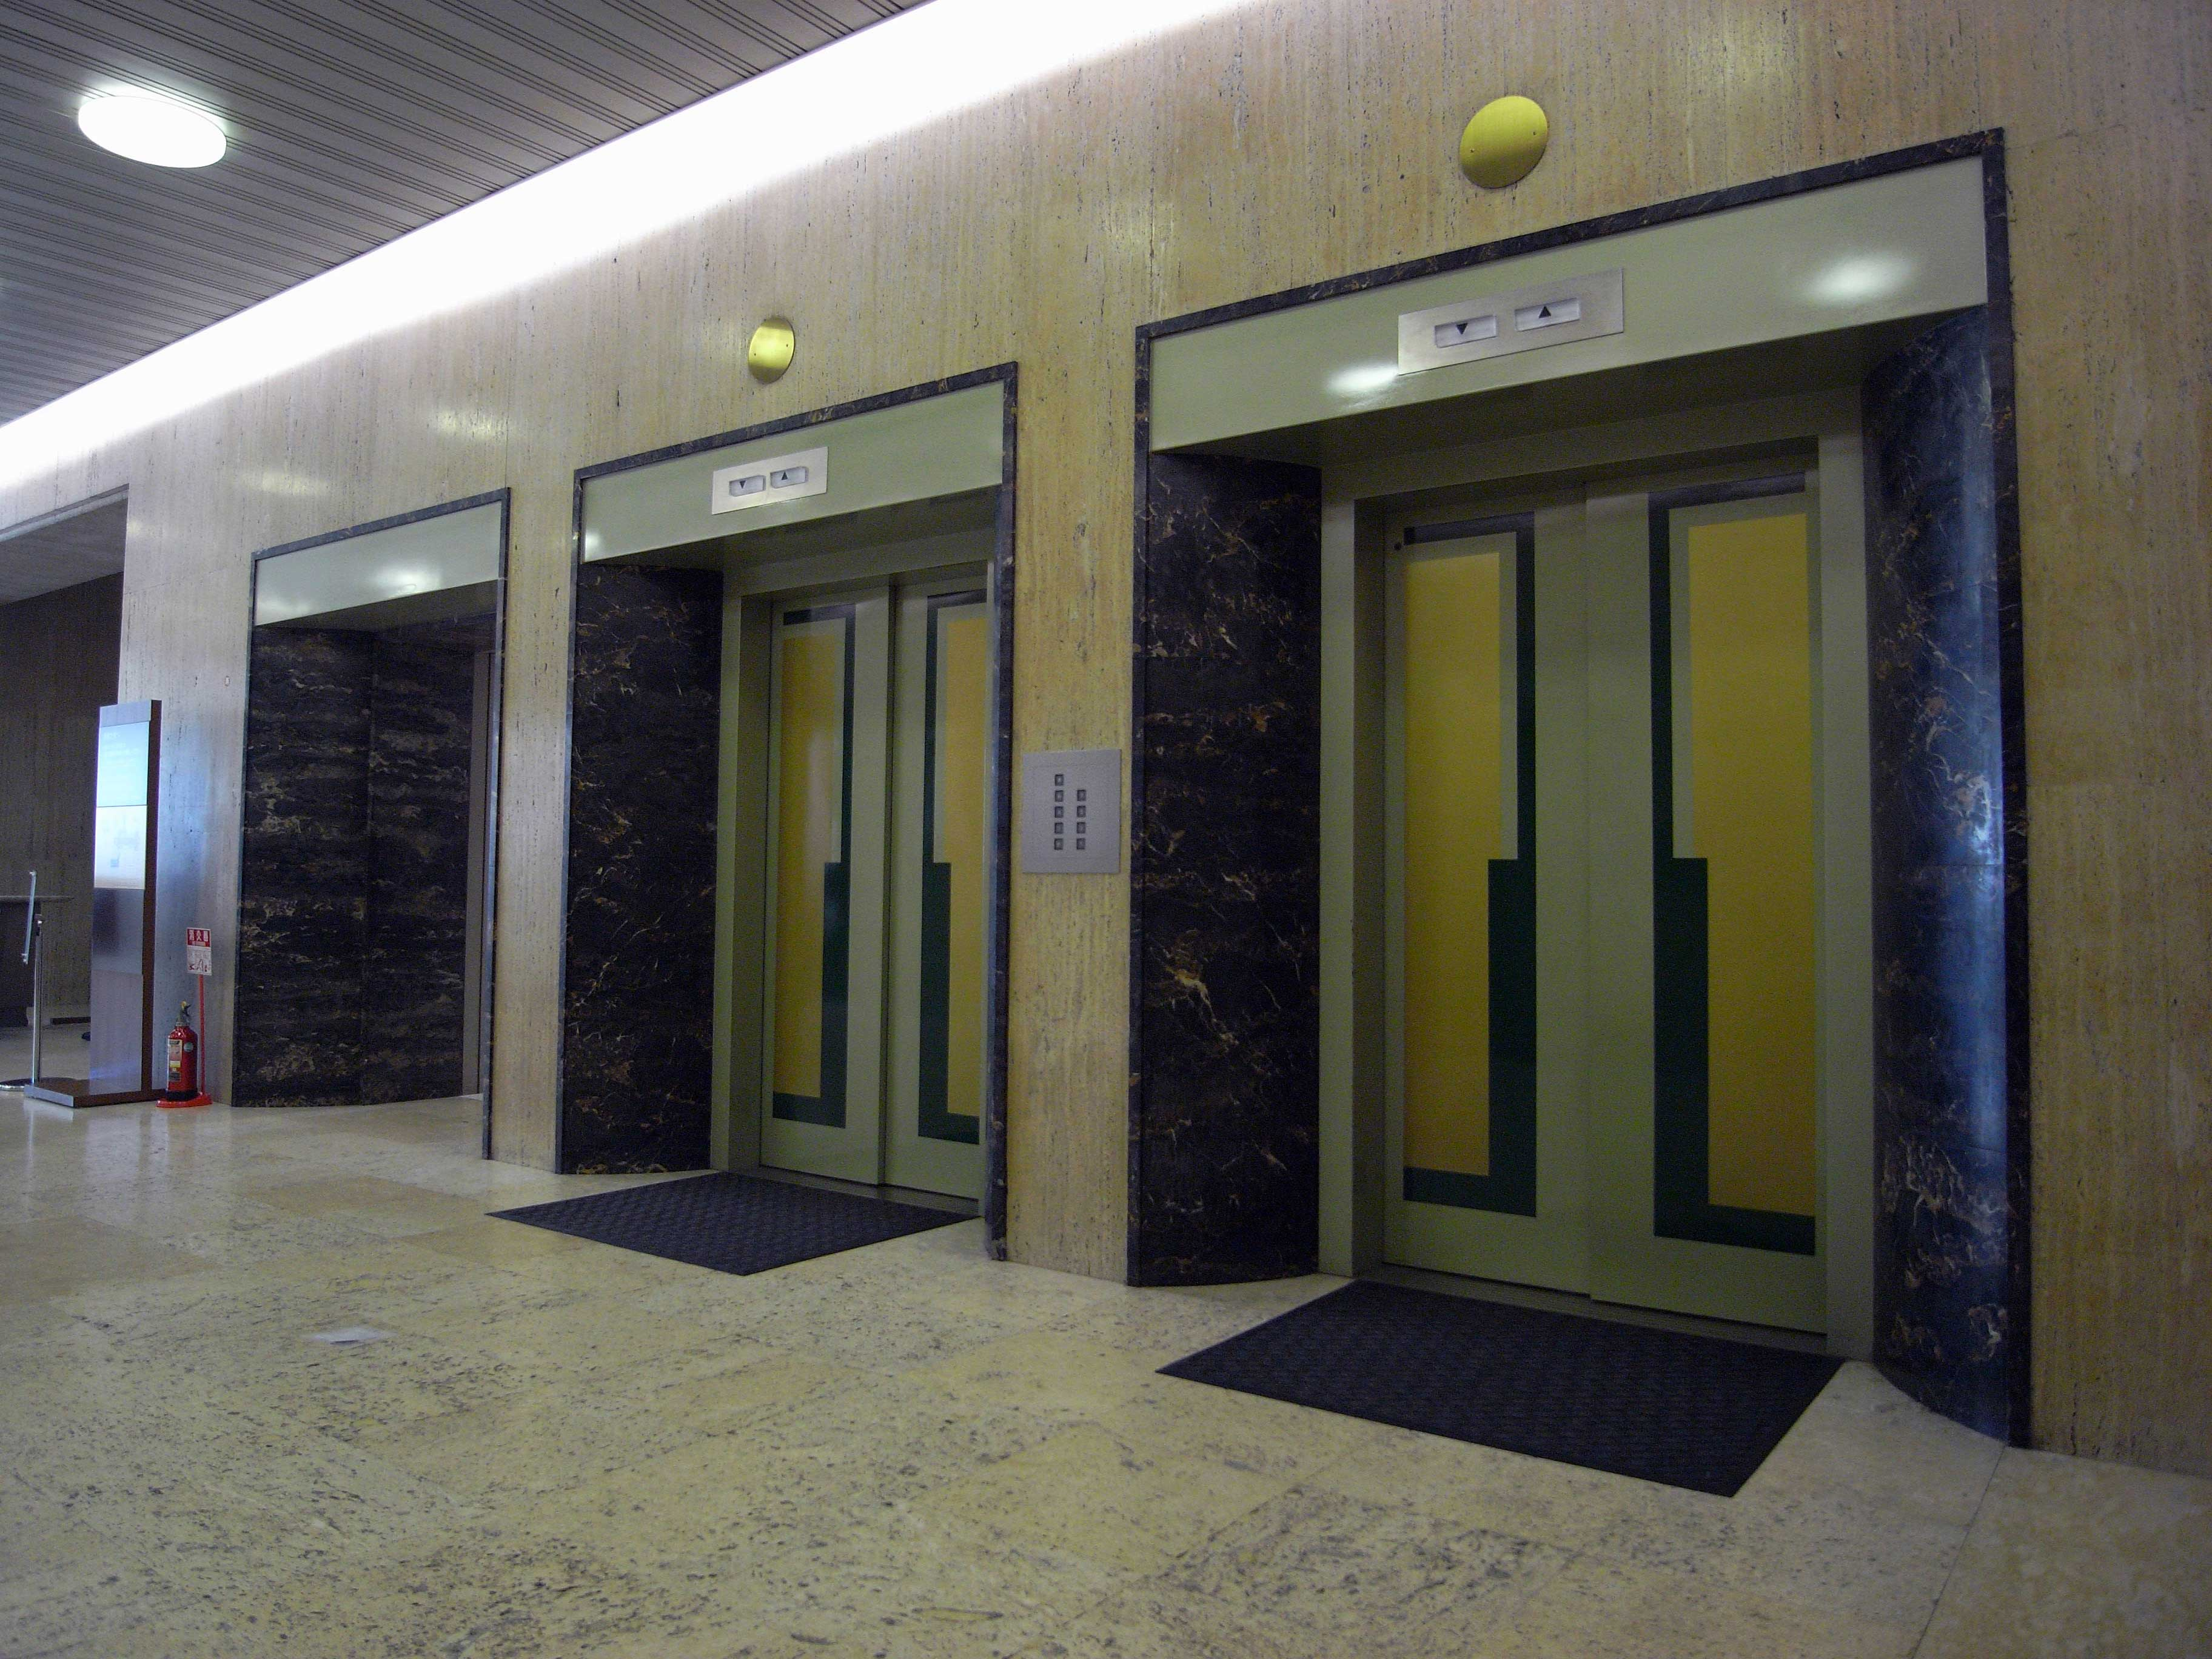 <p>1階エレベーターホール</p>床は琉球産トラバーチン(大理石)、壁はイタリア産のトラバーチンが貼られ、竣工当時の面影を残している。